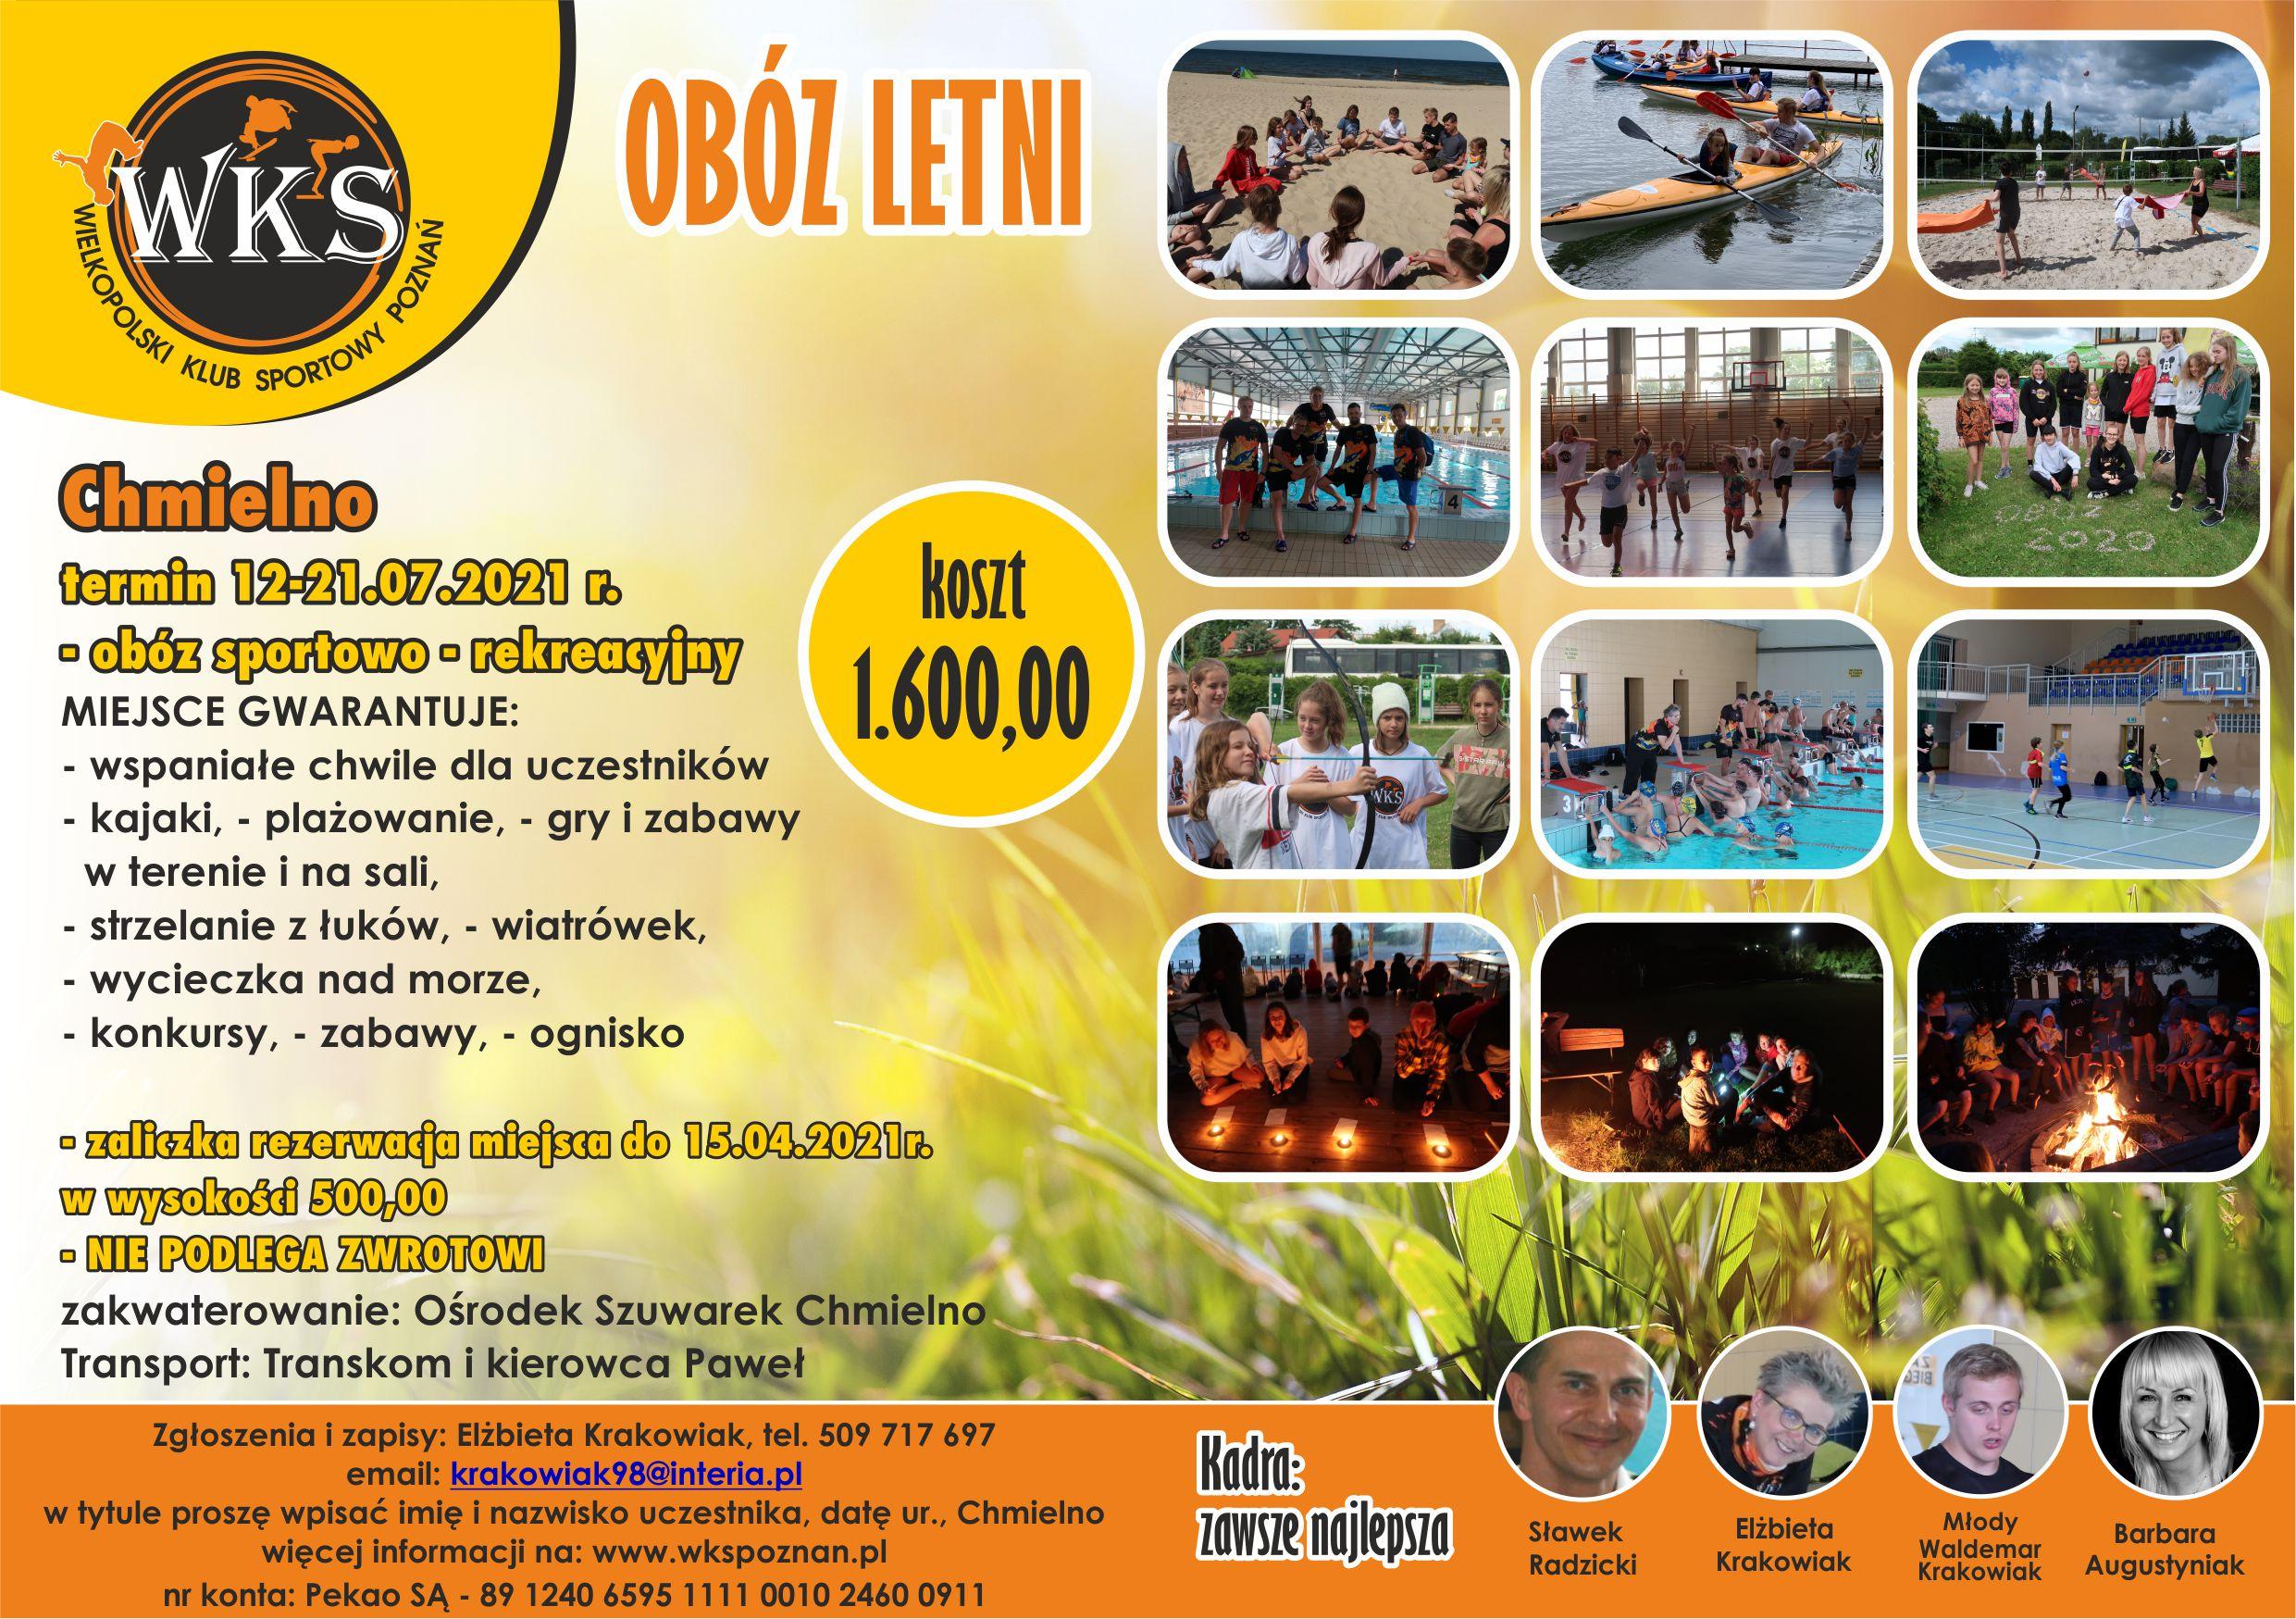 Obóz Chmielno – info!!!